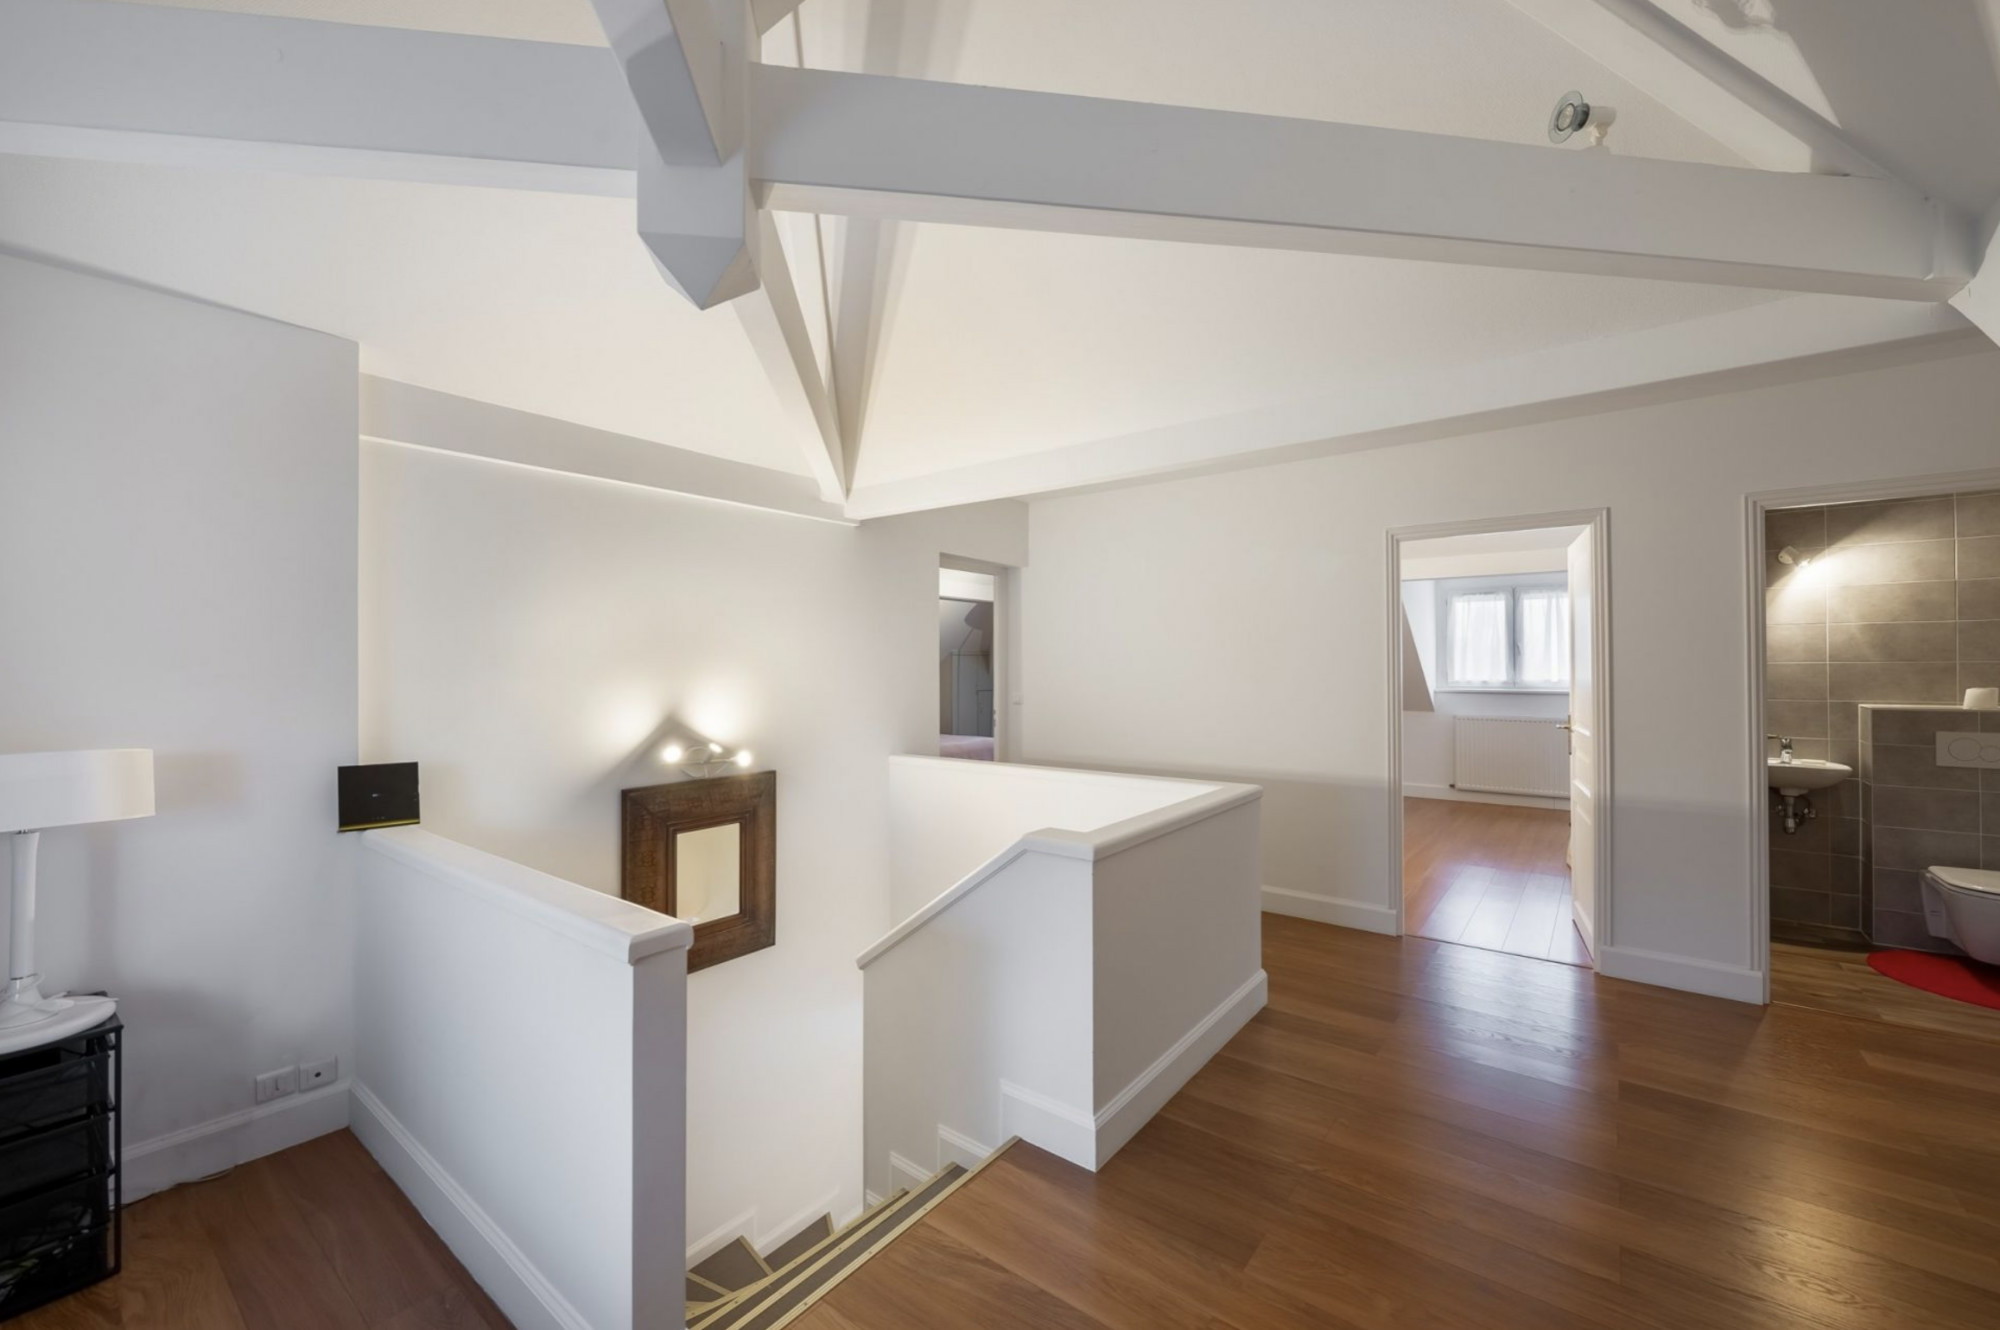 Real Estate in France close to Geneva Switzerland